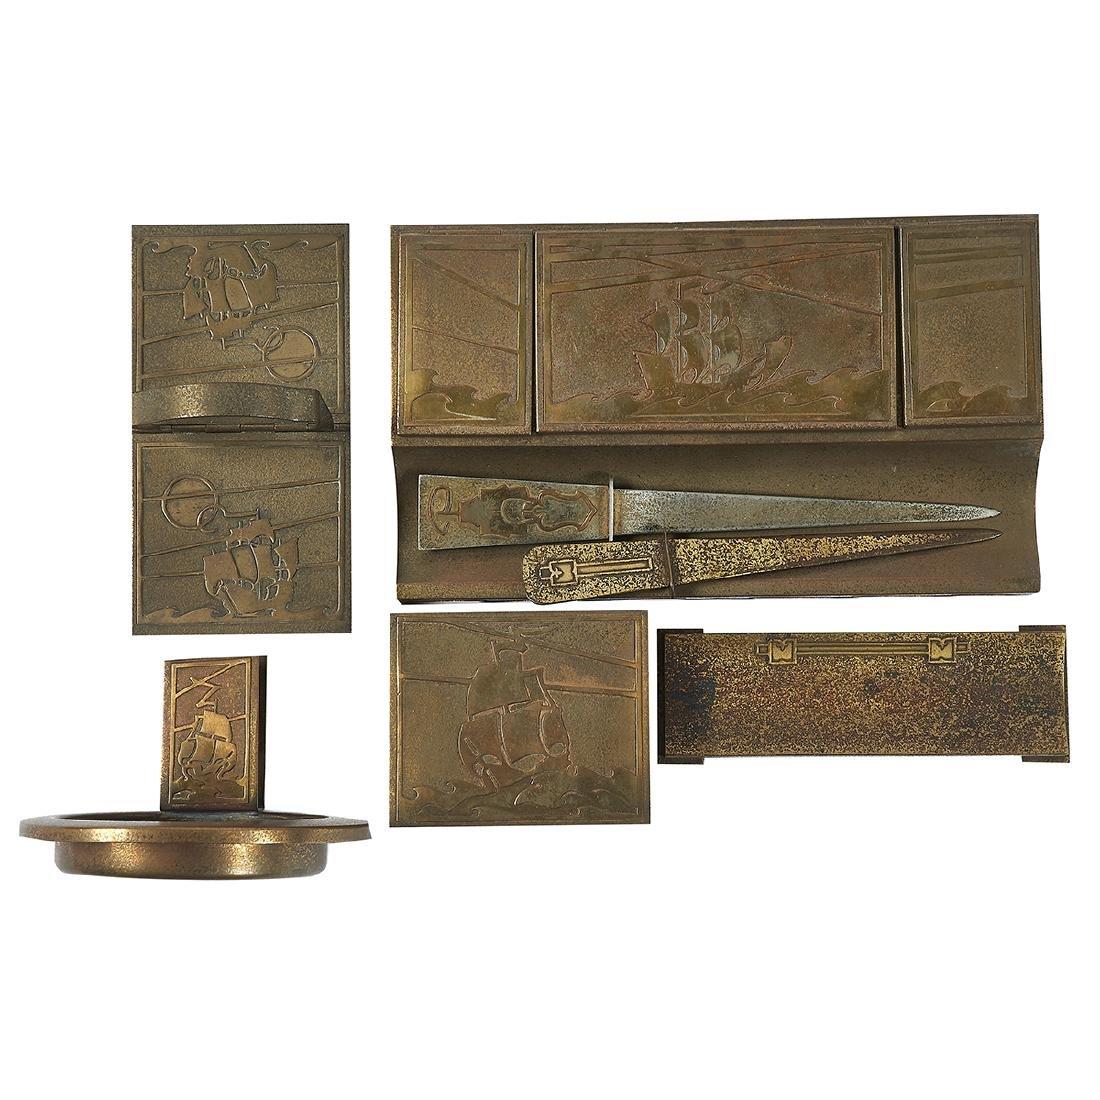 Smith Metal Arts Co. Silver Crest line desk set - 2